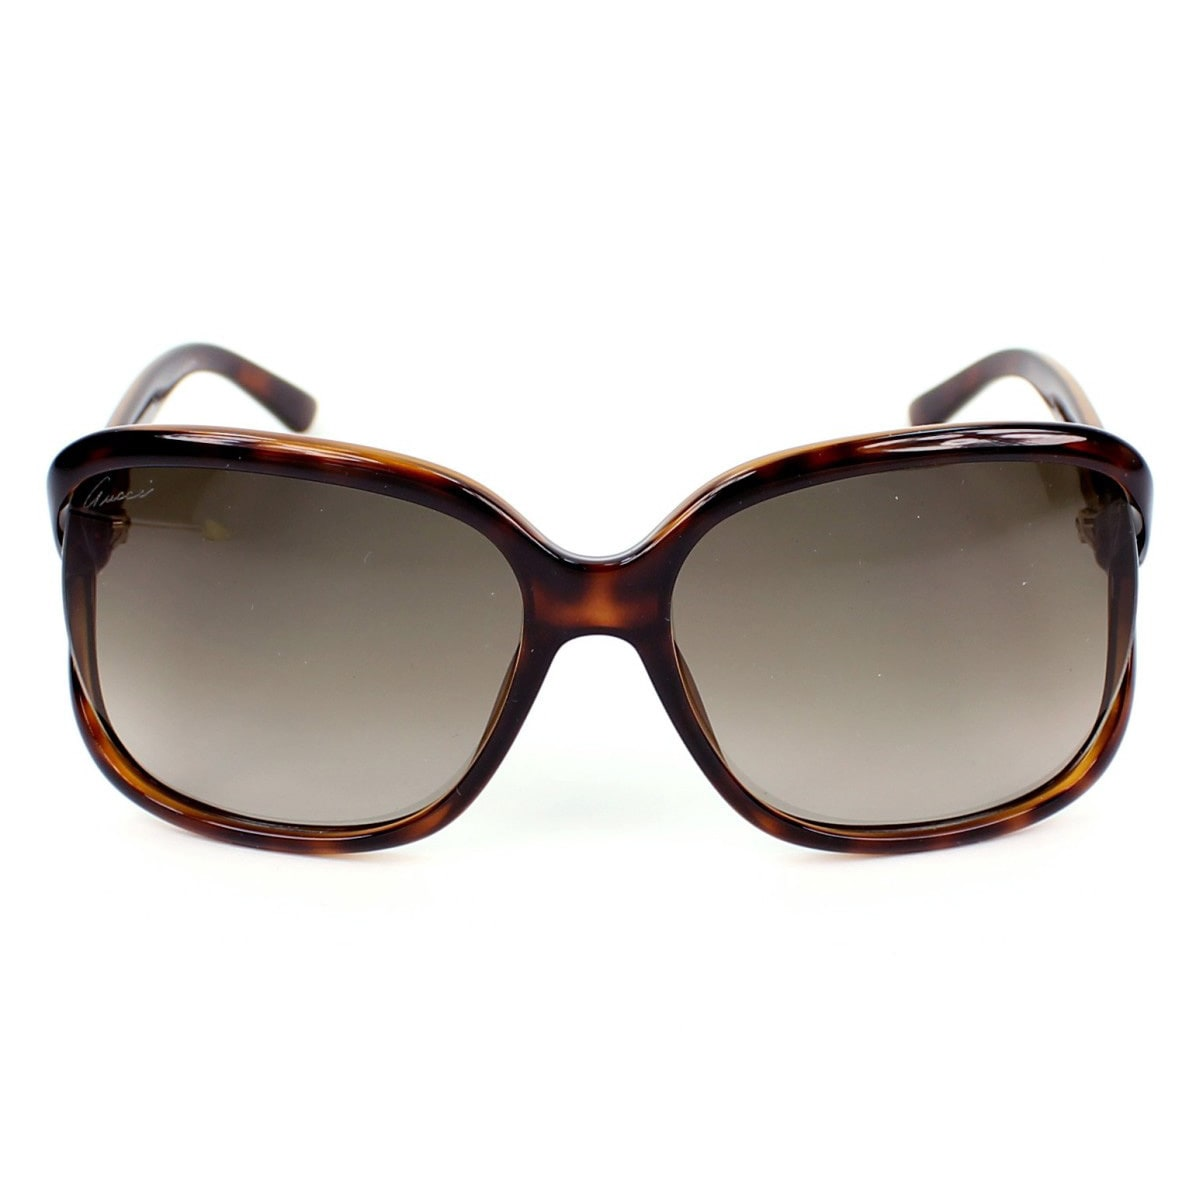 e4c7d6ca8f362 Shop Gucci Women s  Gucci 3646 S DWJHA  Havana Rectangle Sunglasses - Free  Shipping Today - Overstock - 9423153